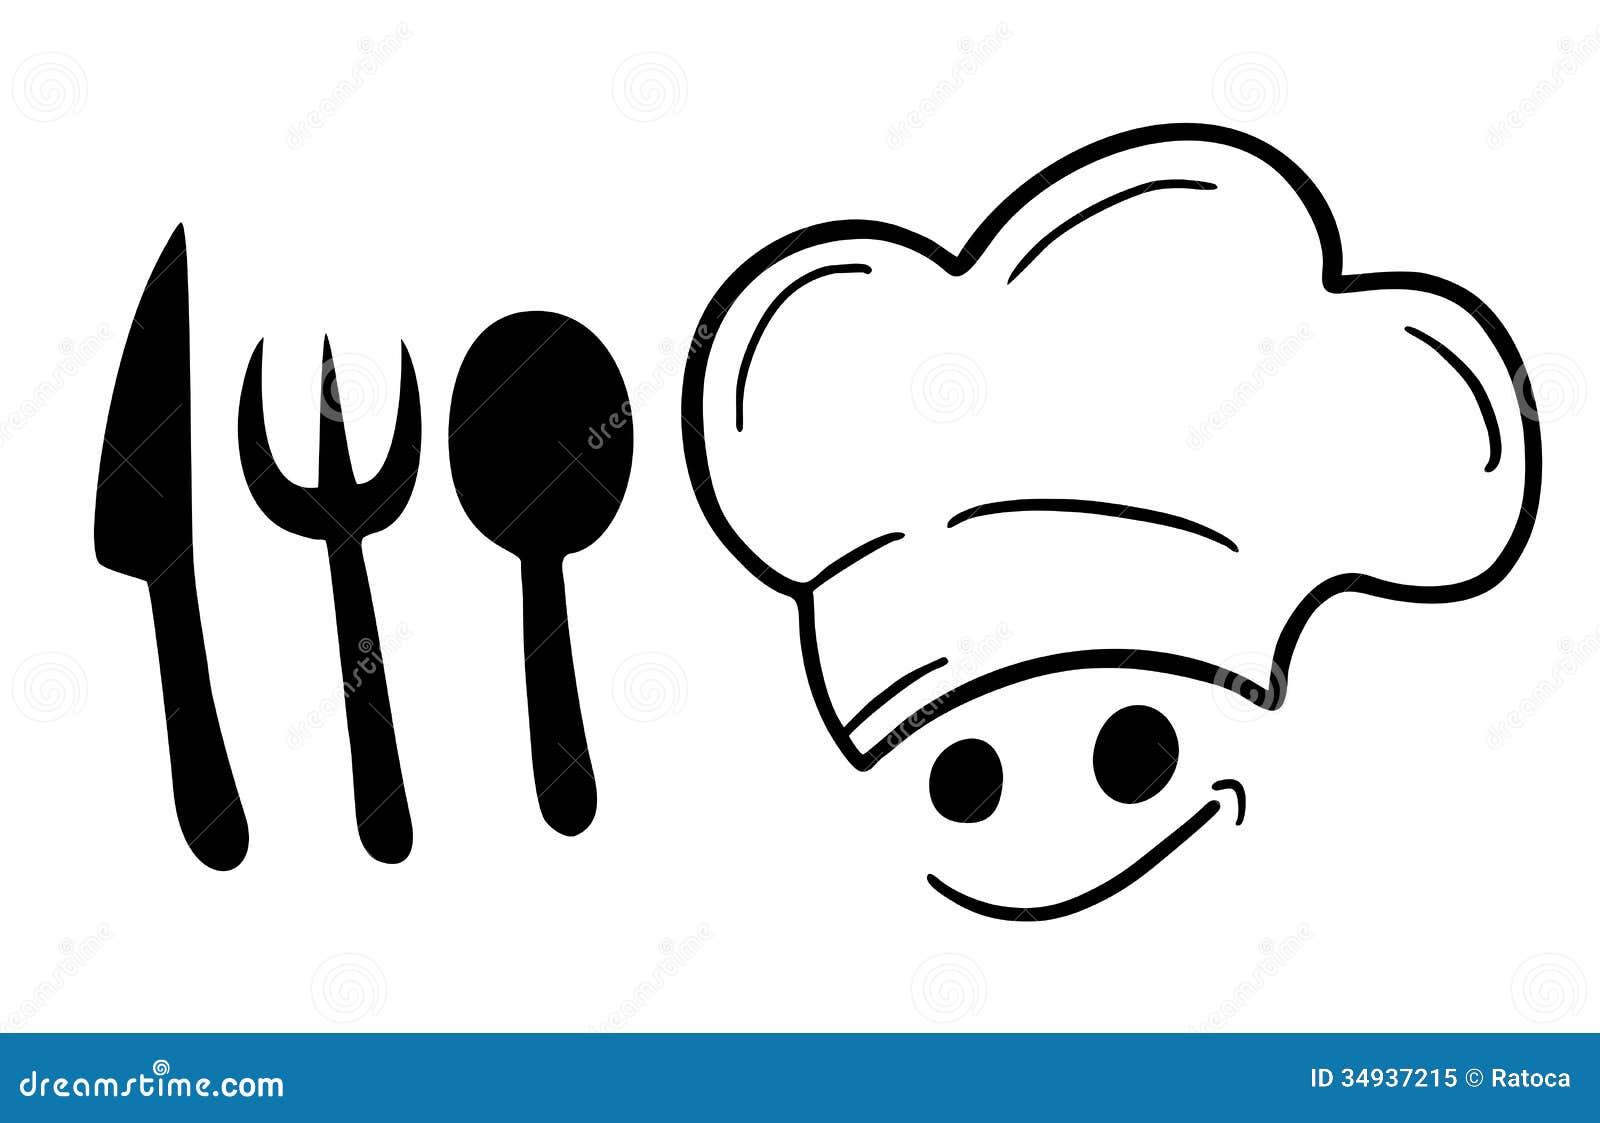 Symbol Chef Royalty Free Stock Photo - Image: 34937215